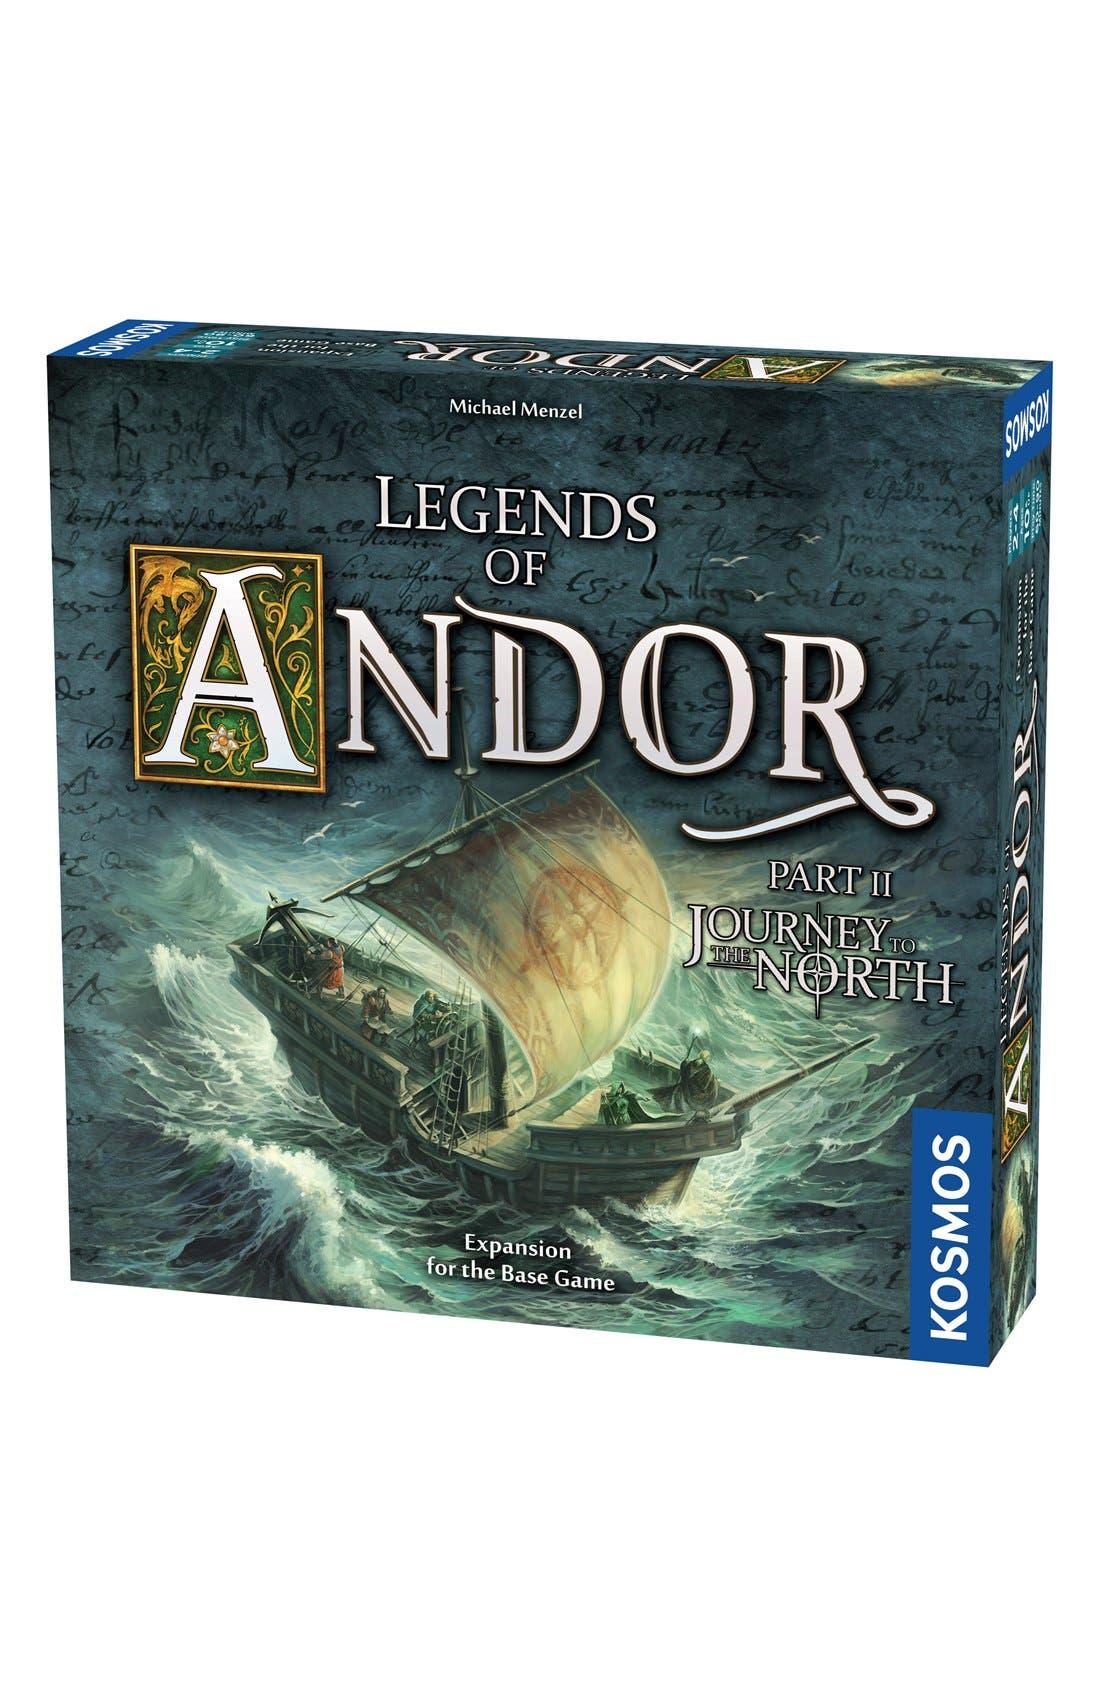 'Legends of Andor - Journey' Game Expansion Pack,                             Main thumbnail 1, color,                             Orange